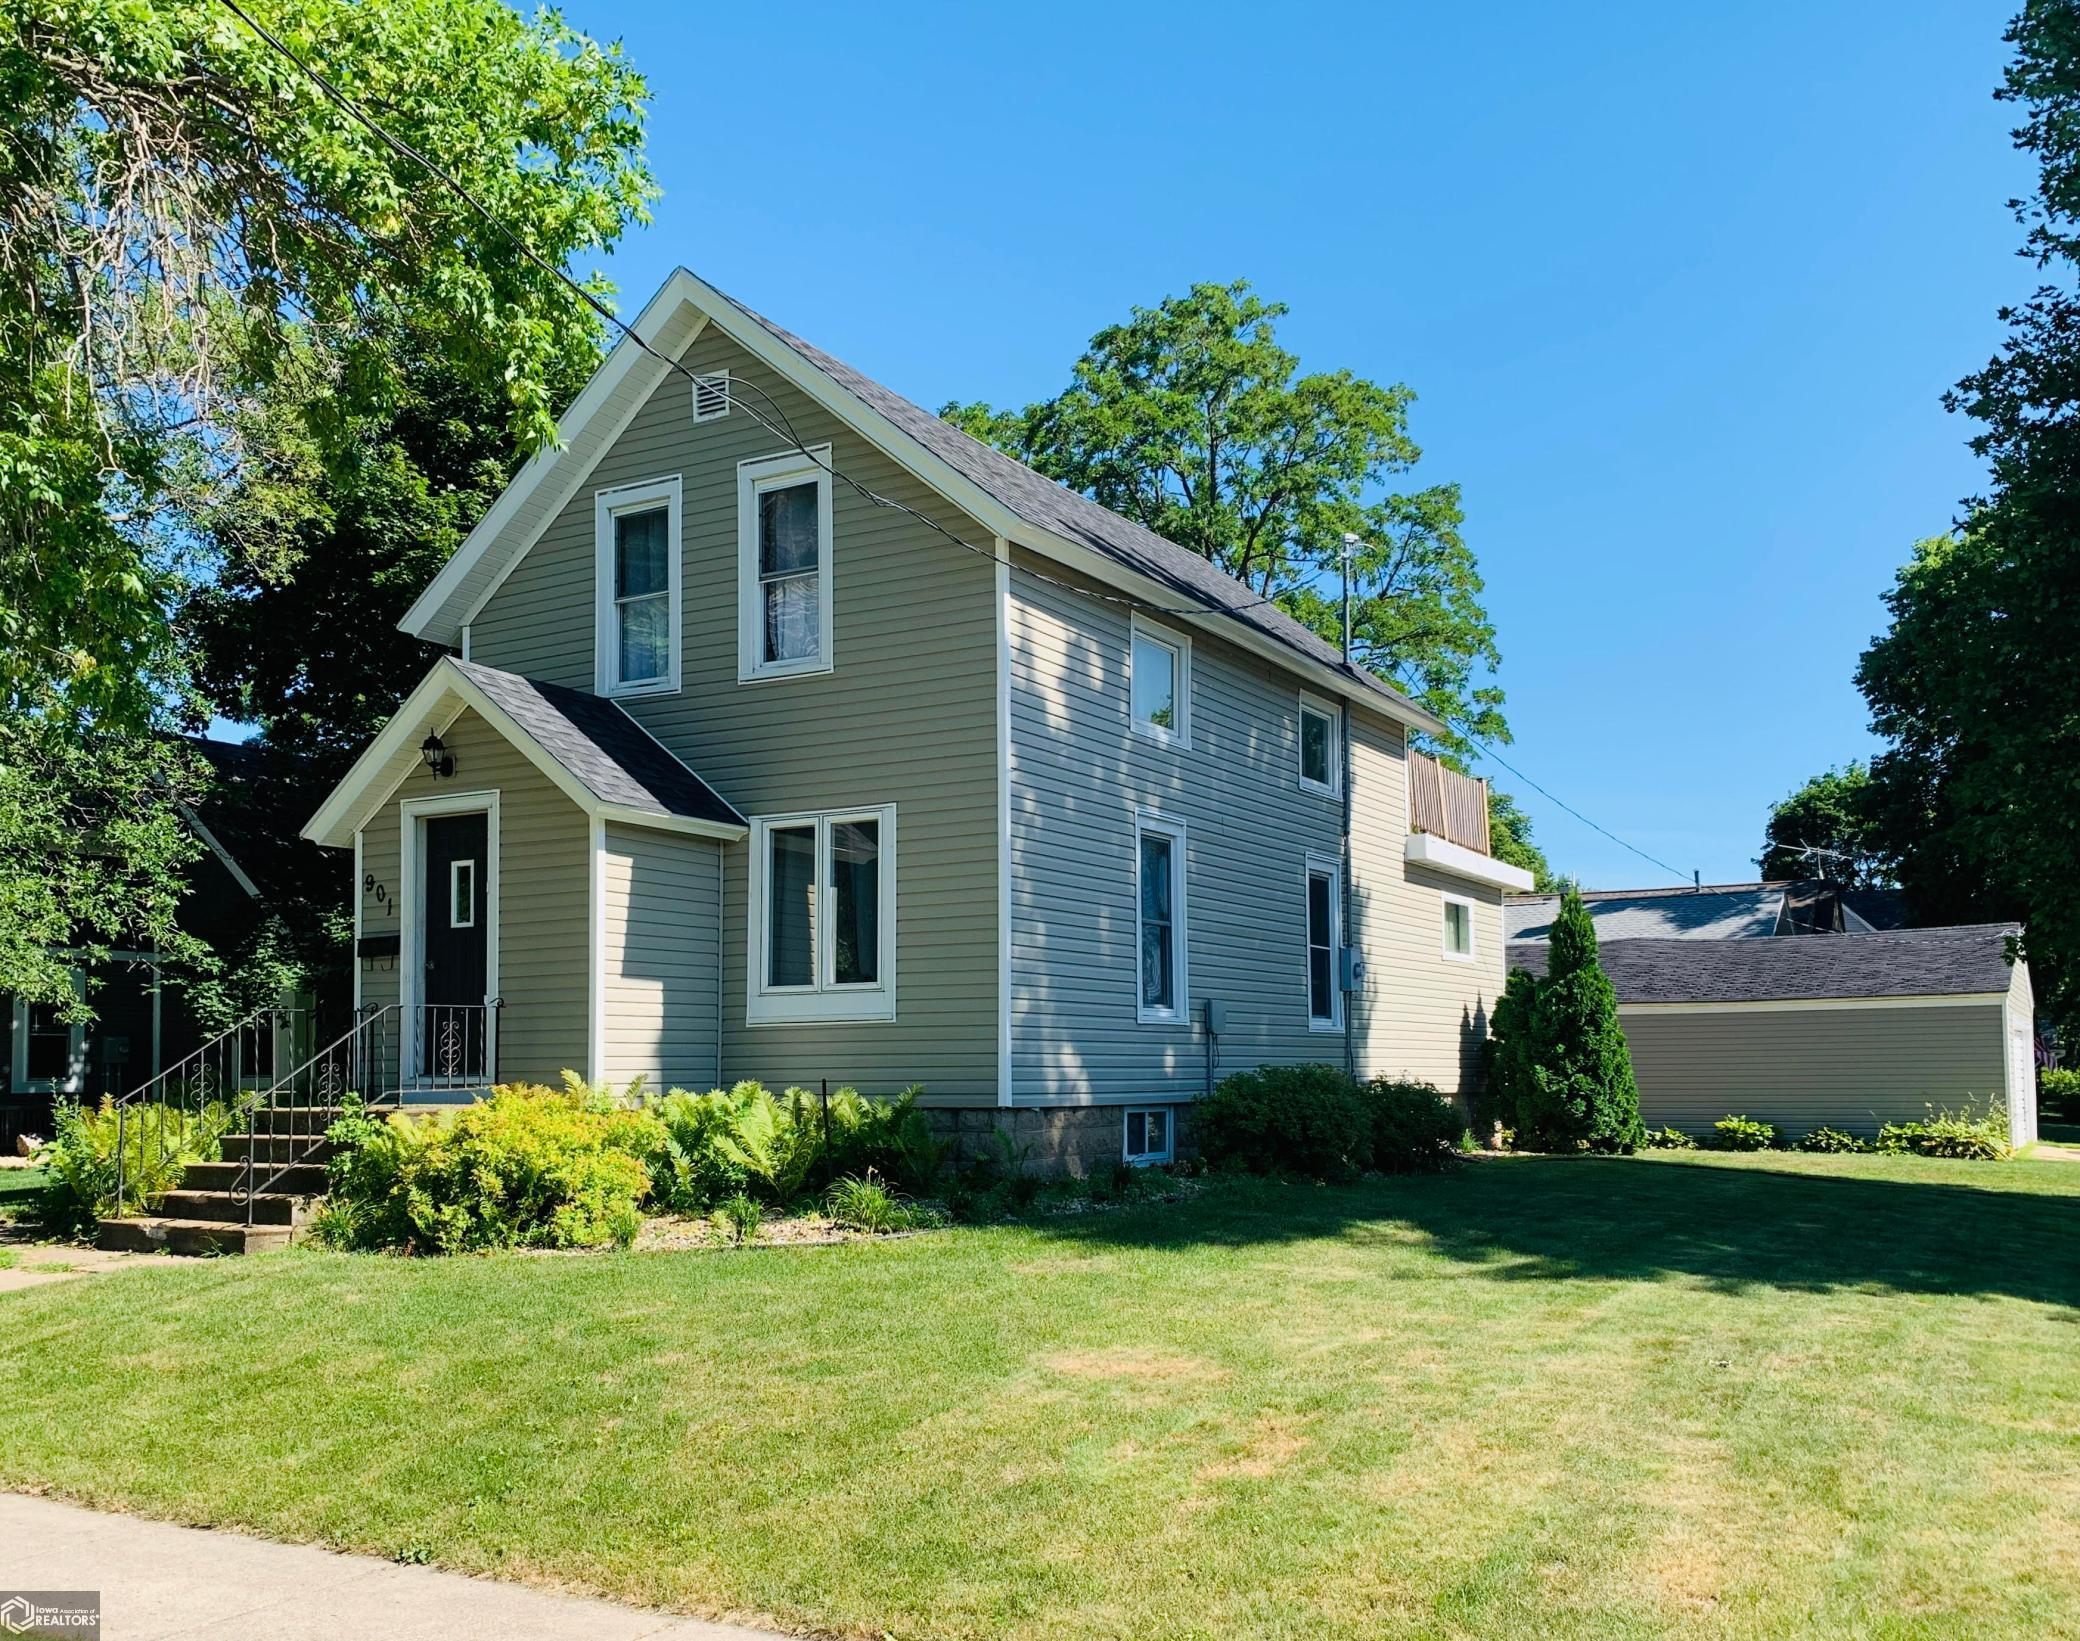 901 7th N Property Photo - Clear Lake, IA real estate listing